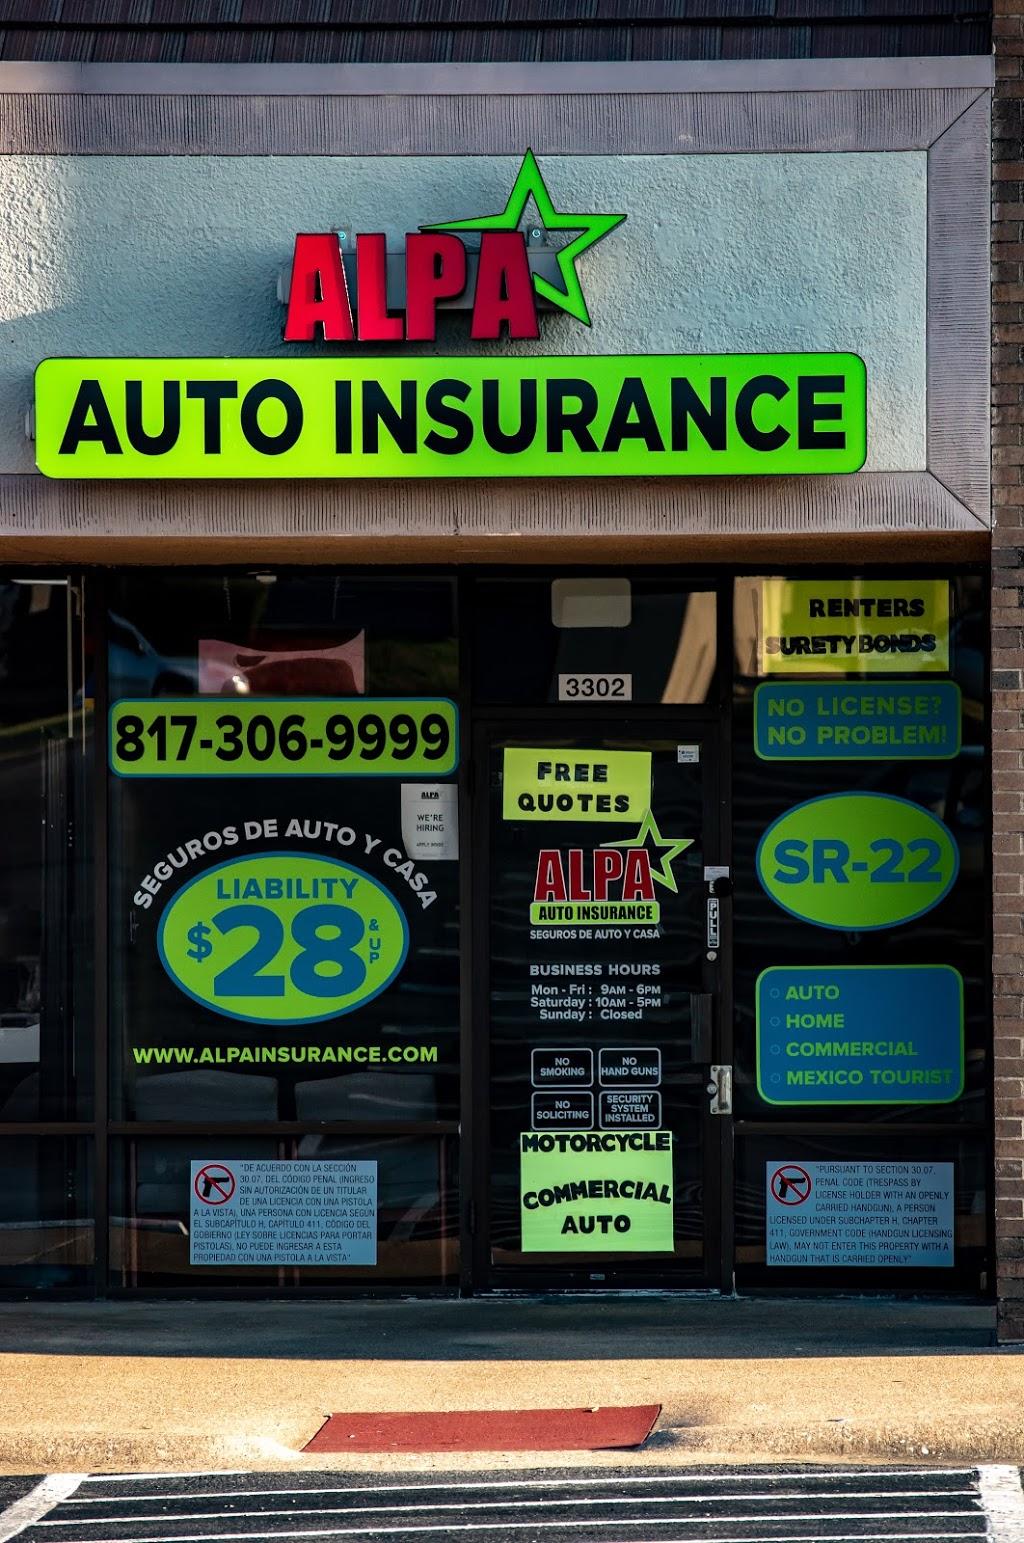 Alpa Auto Insurance | insurance agency | 3302 Harwood Rd, Bedford, TX 76021, USA | 8173069999 OR +1 817-306-9999